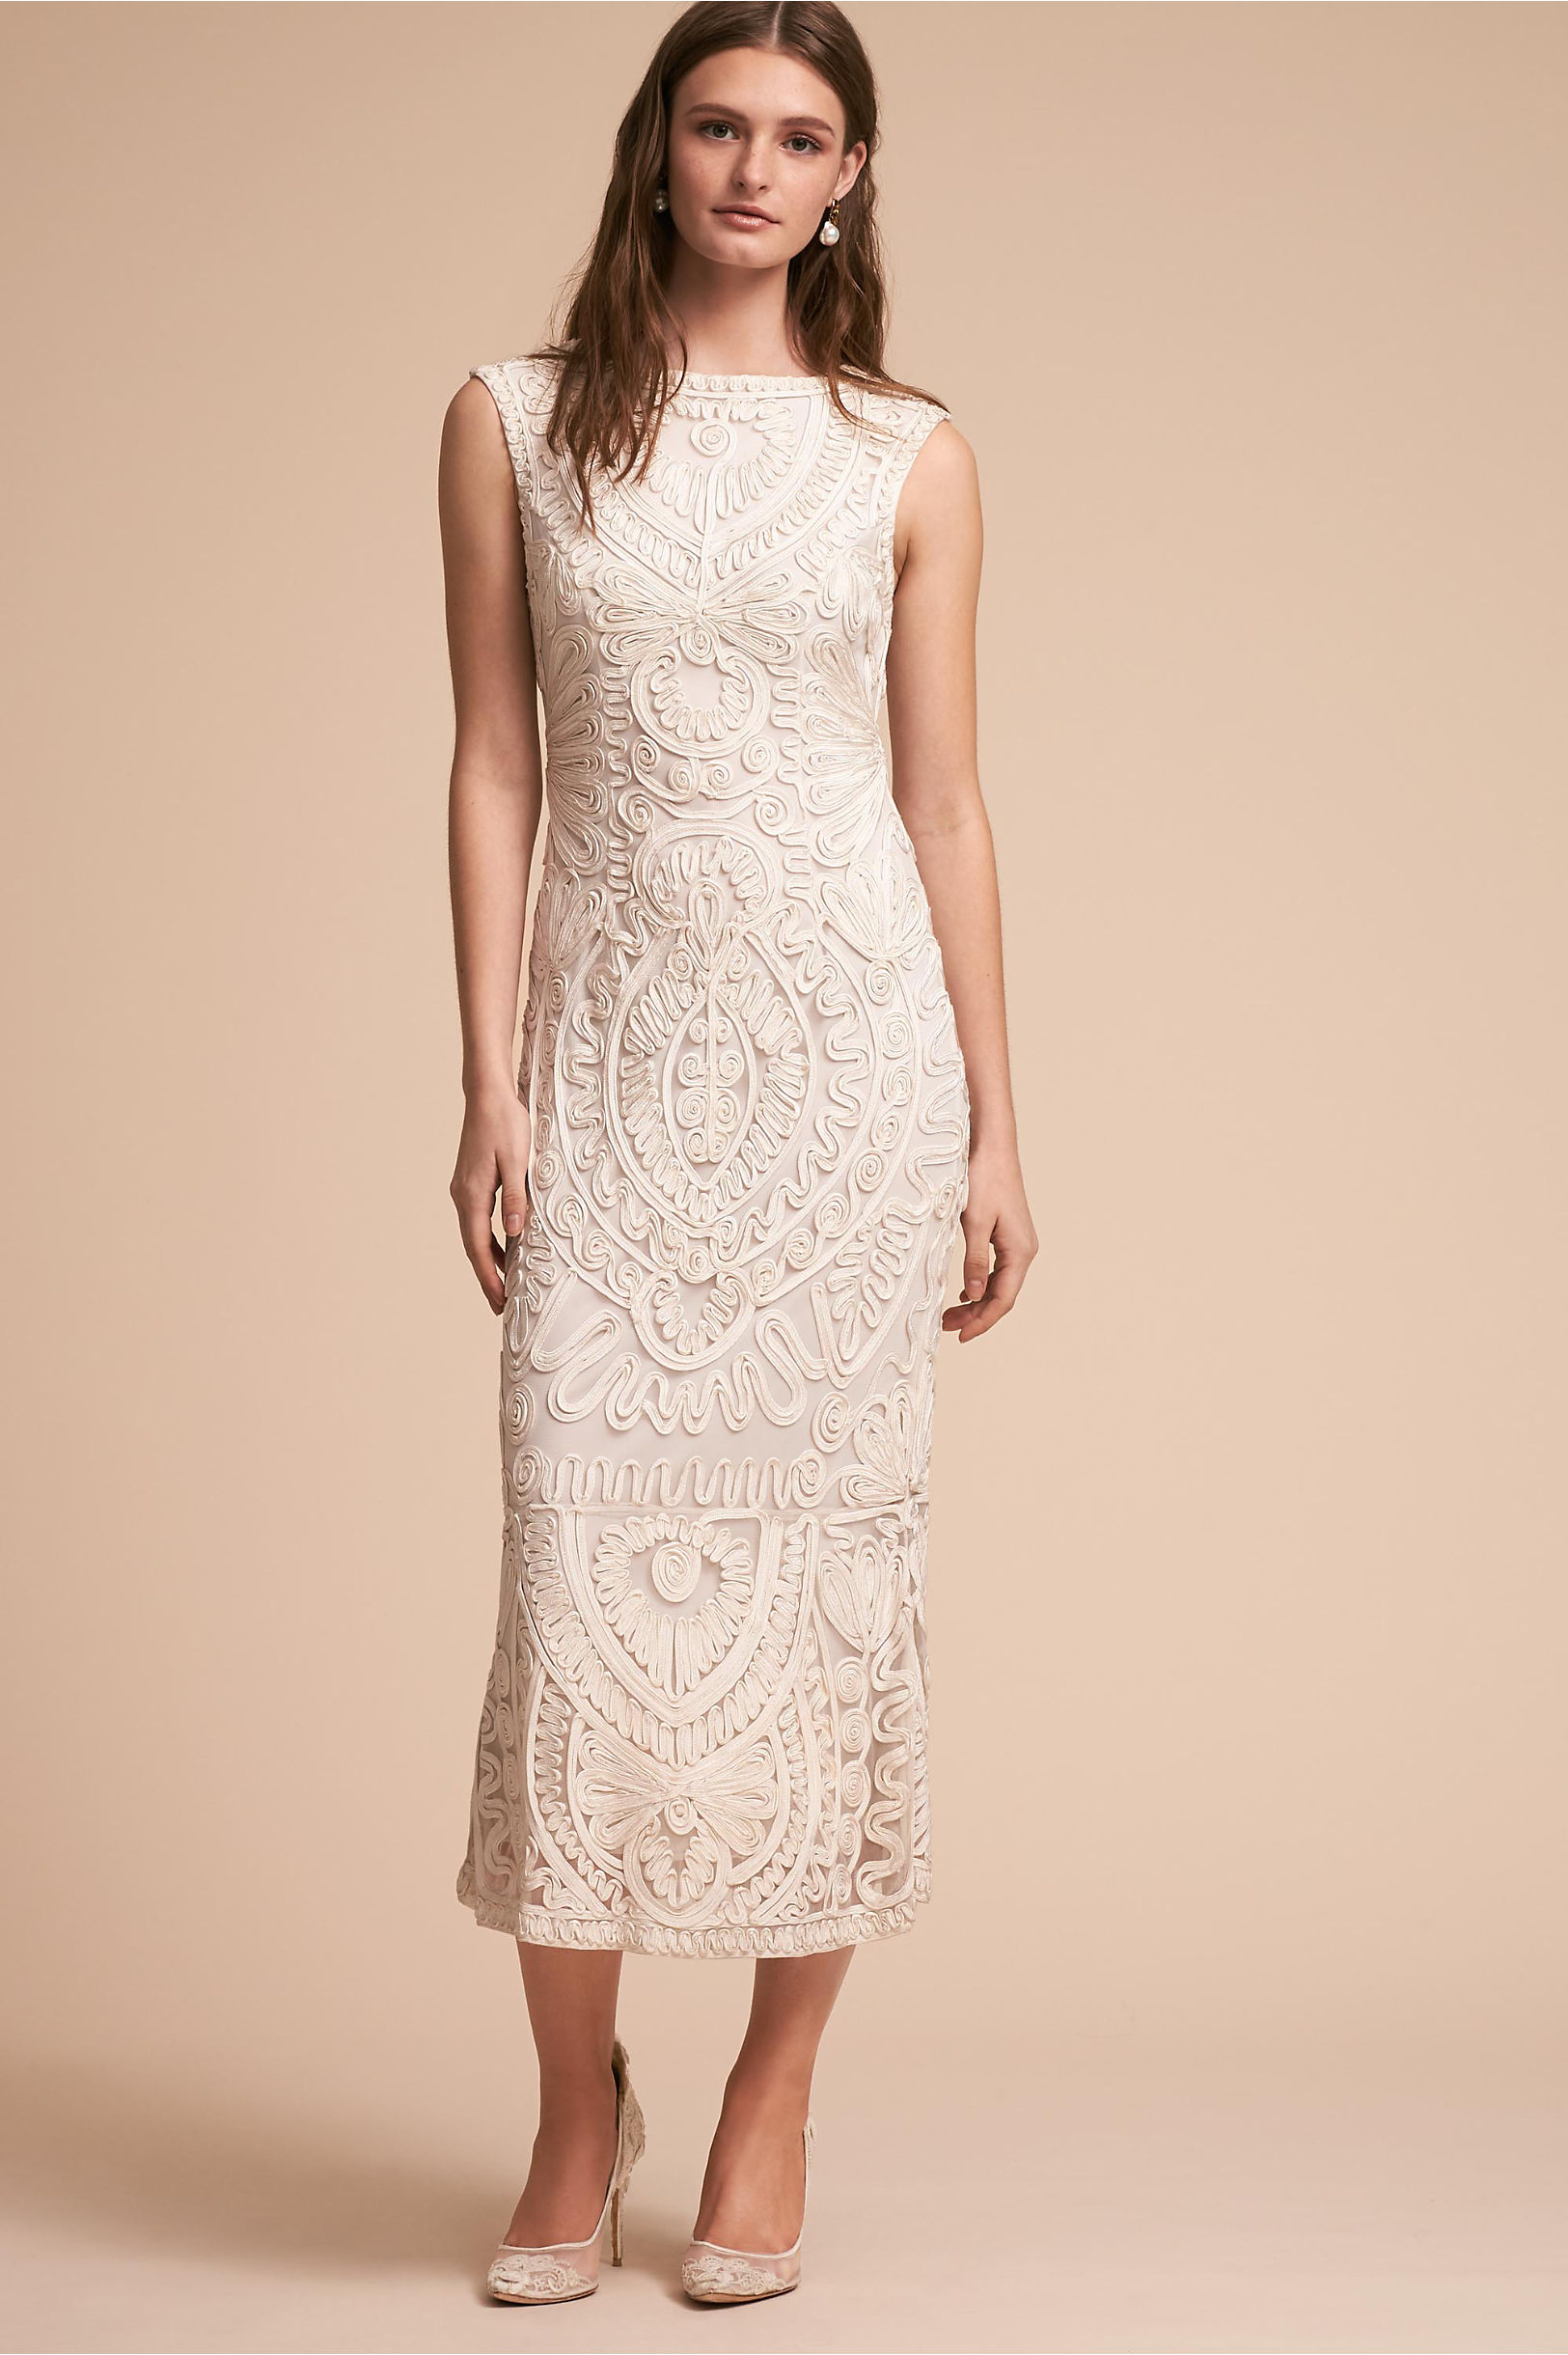 Nevado Dress in Sale | BHLDN